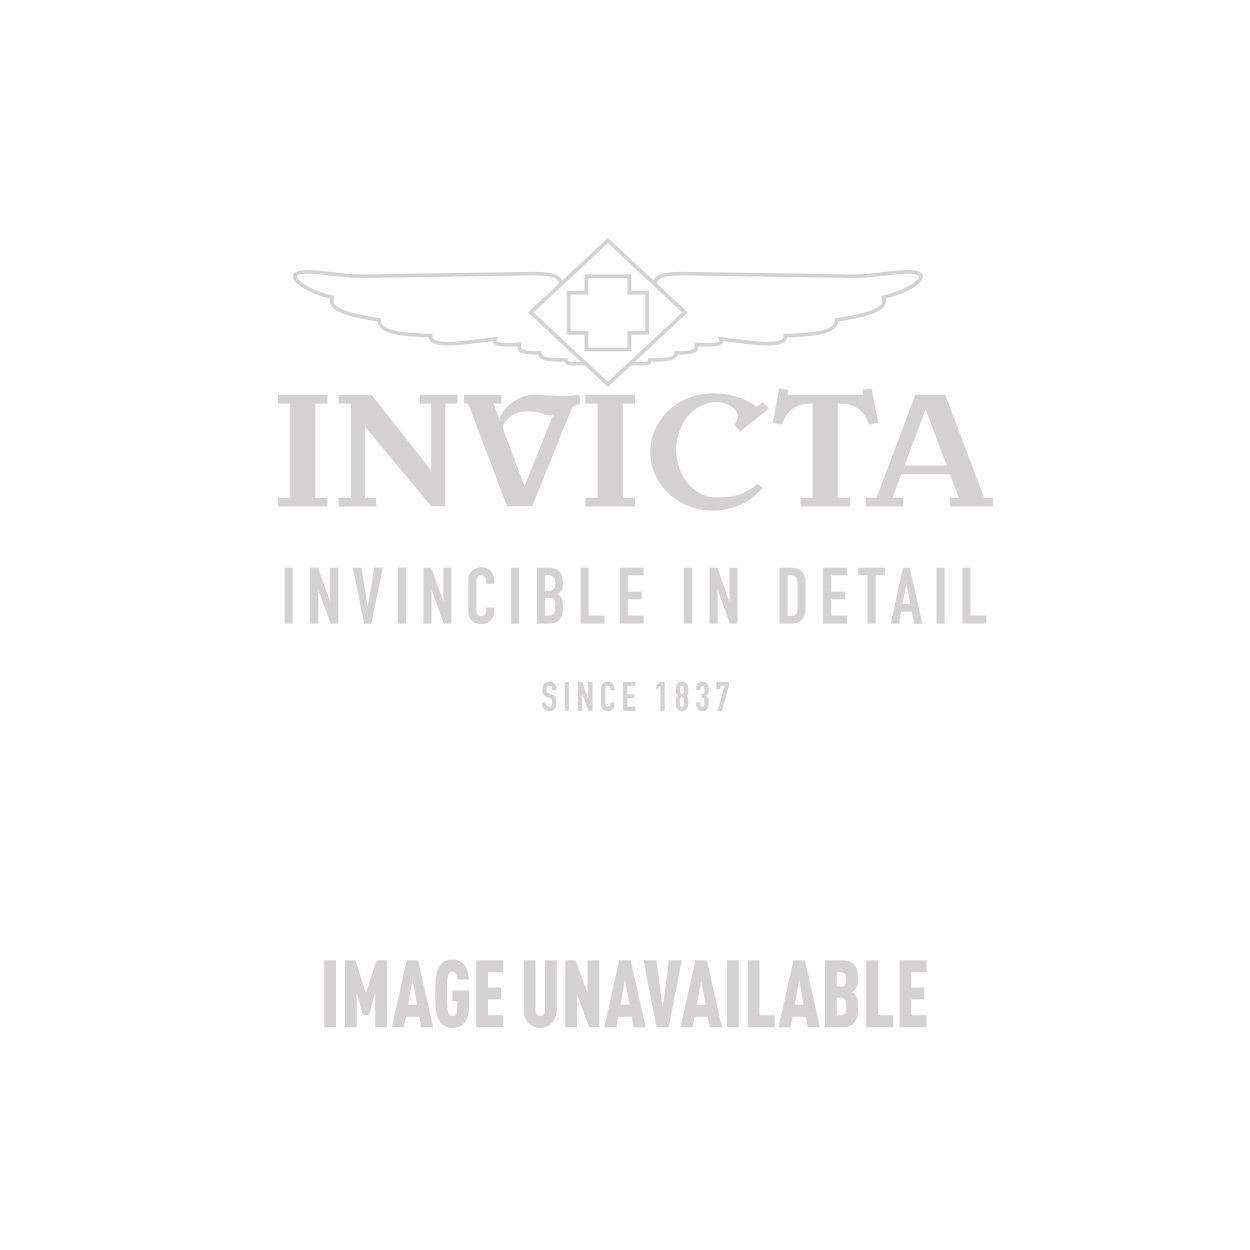 7b30d8558 Invicta Speedway Mens Quartz 39.5mm Stainless Steel, Black Case Blue, Black  Dial - Model 23122